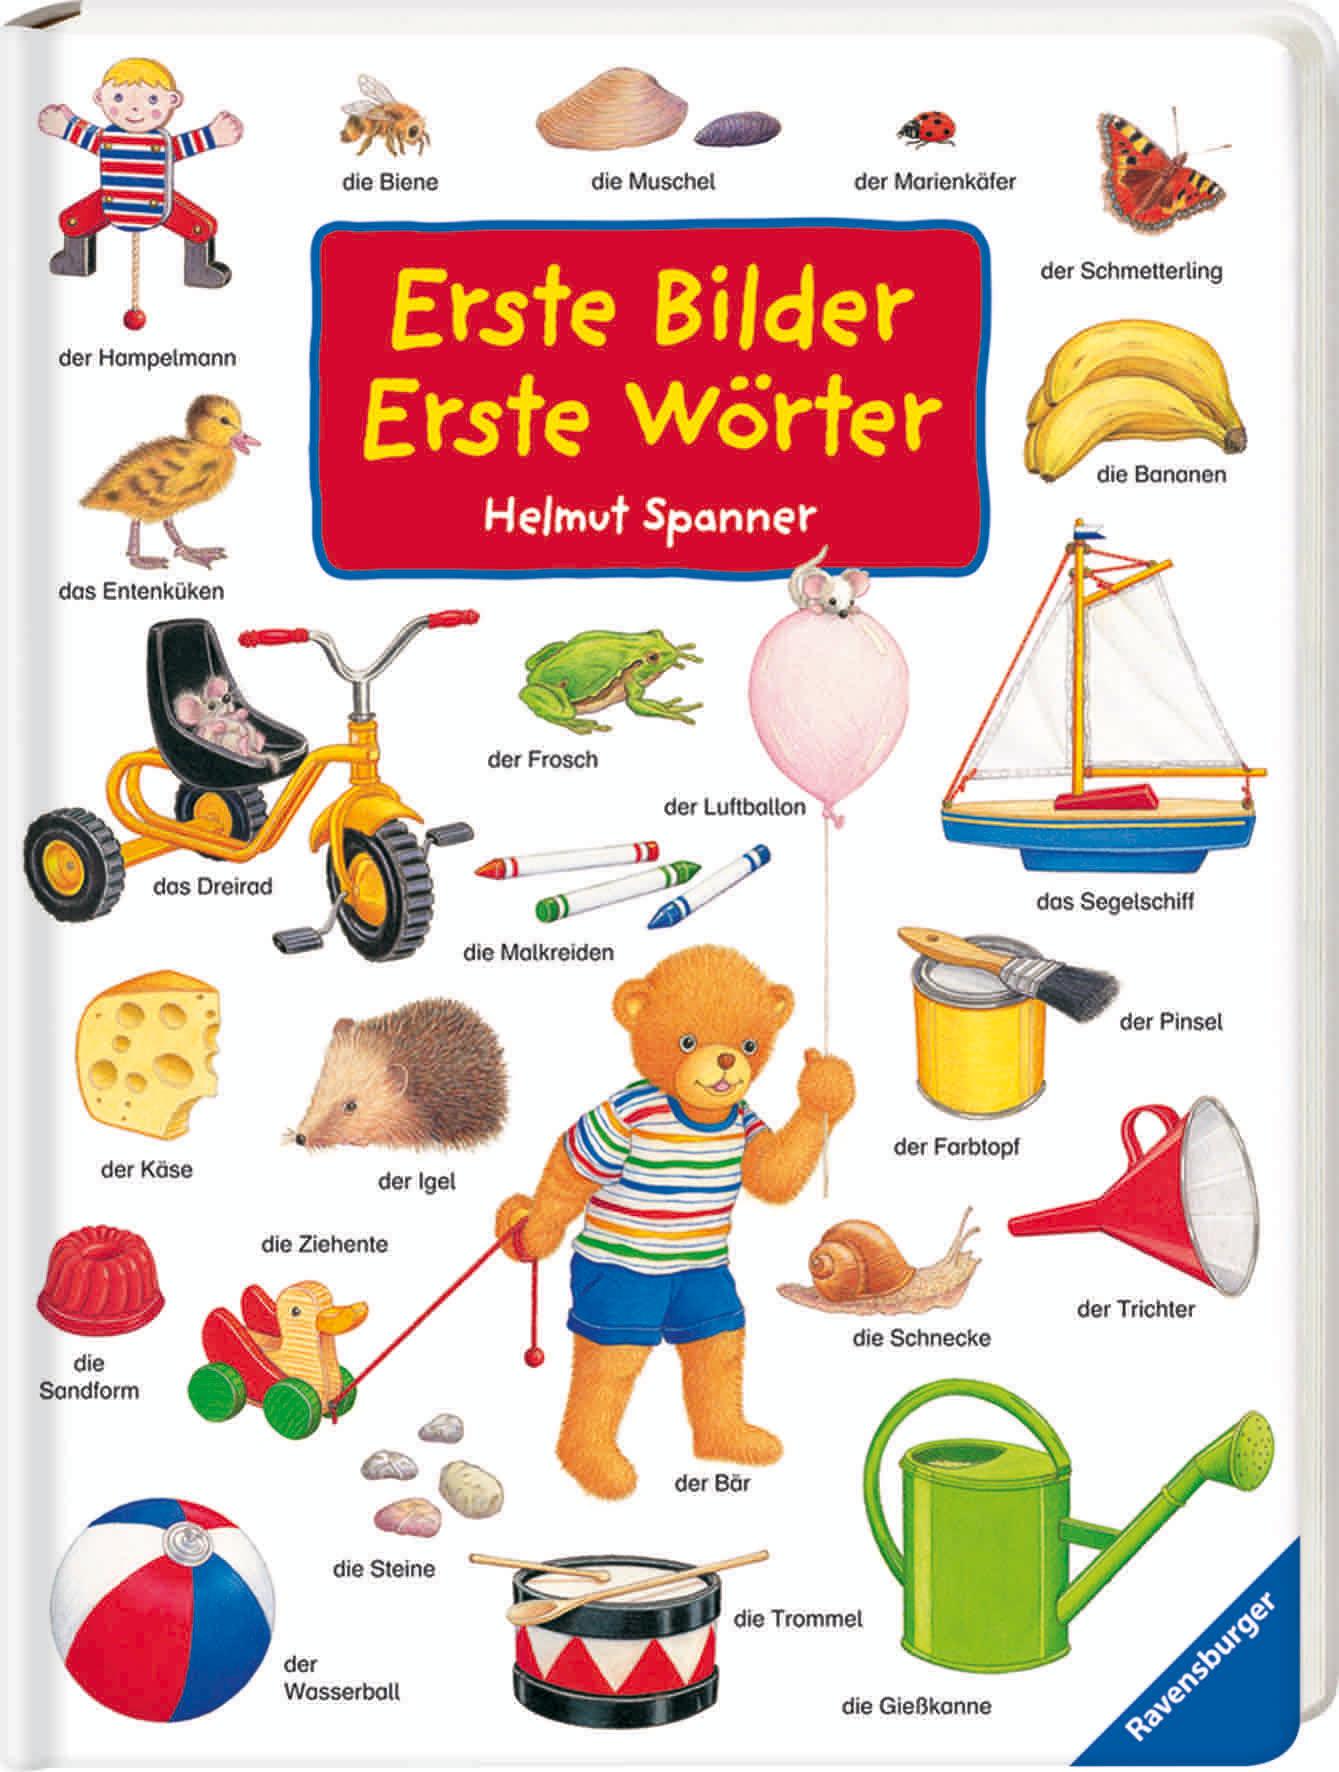 Erste Bilder-Erste Wörter 3D (295 KB)